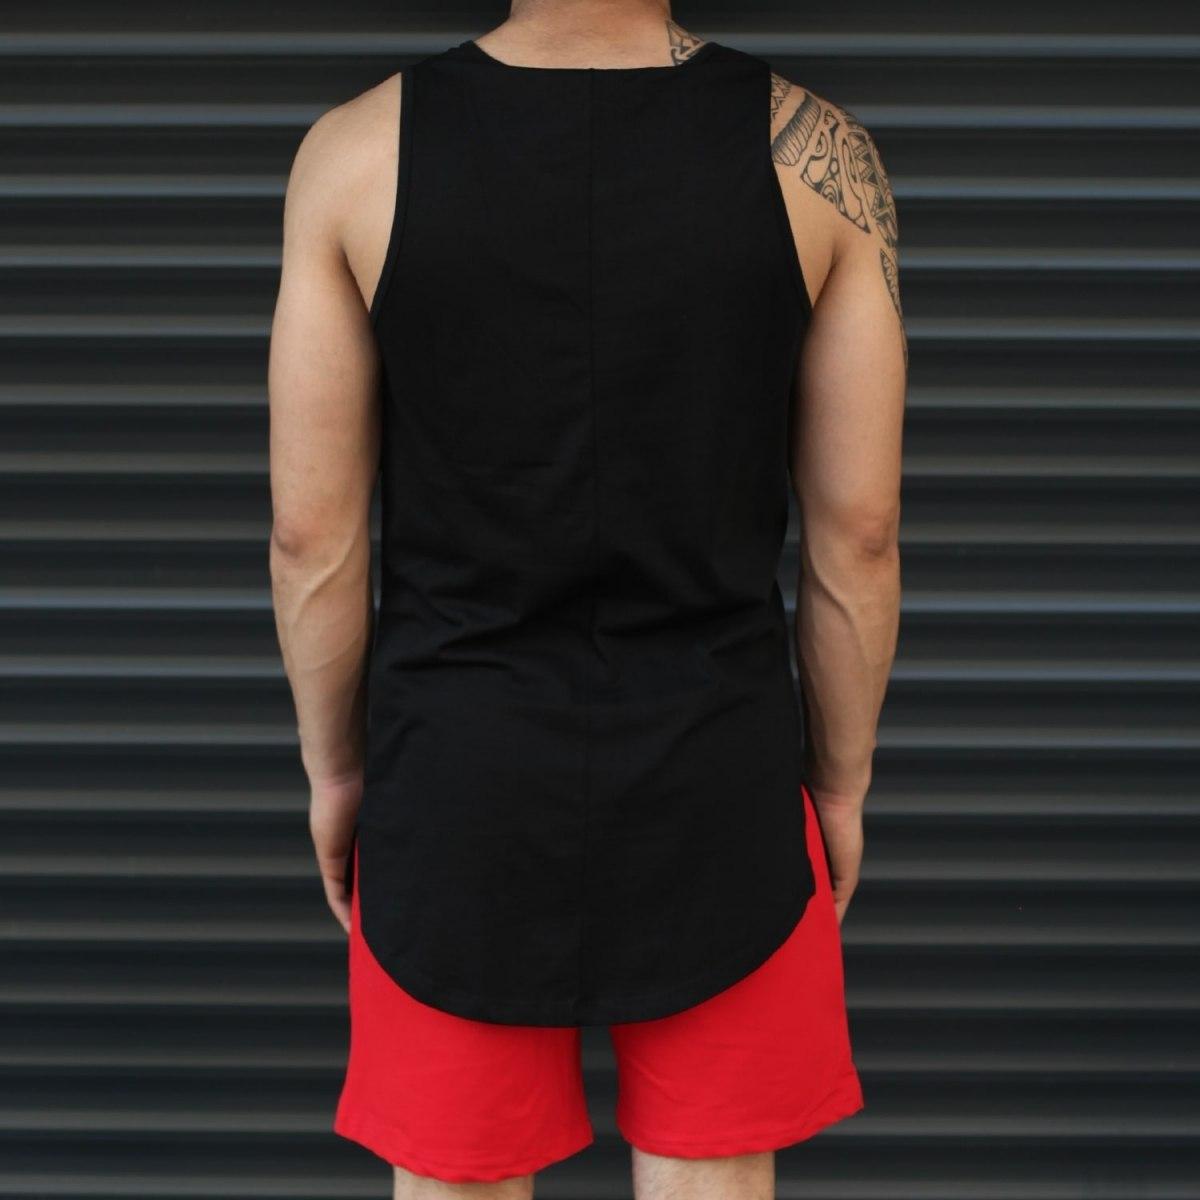 Men's Athletic Sleeveless Tall Tank Top Black Mv Premium Brand - 3